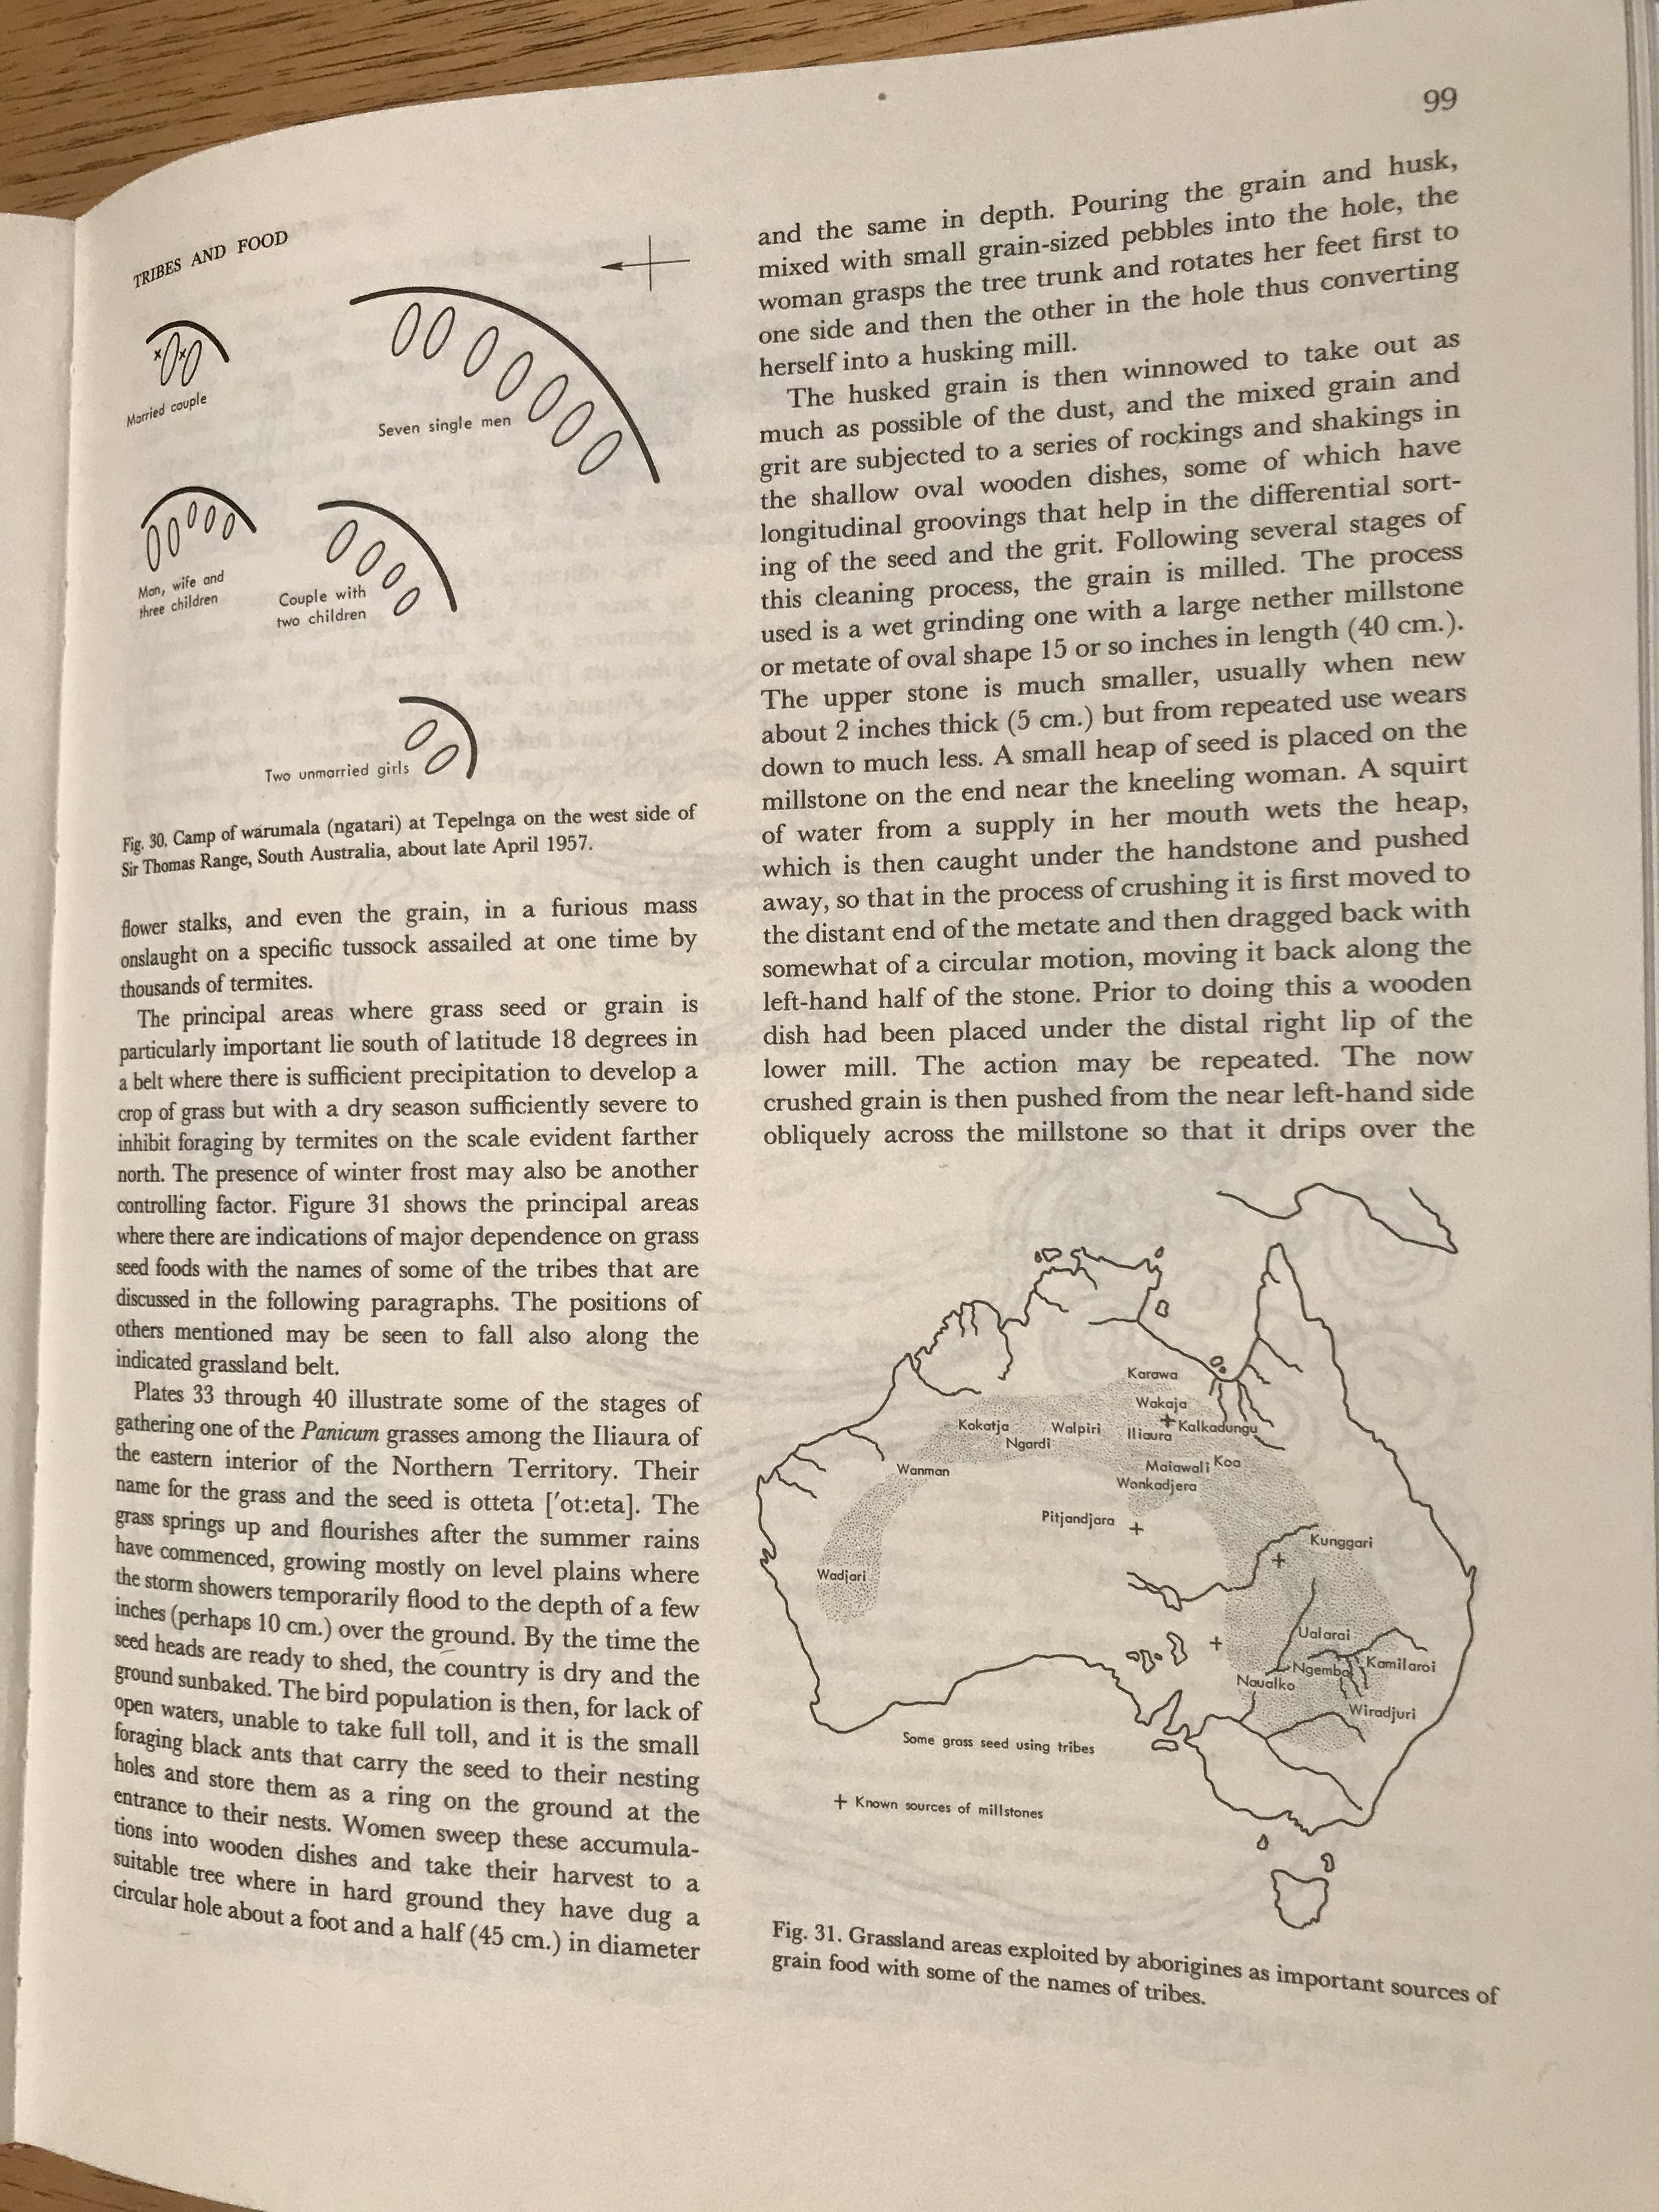 Figure 3 :  Original 'Tindales's Arc' from Norman Tindale,  Aboriginal Tribes of Australia,  UC Press, 1974, p99.